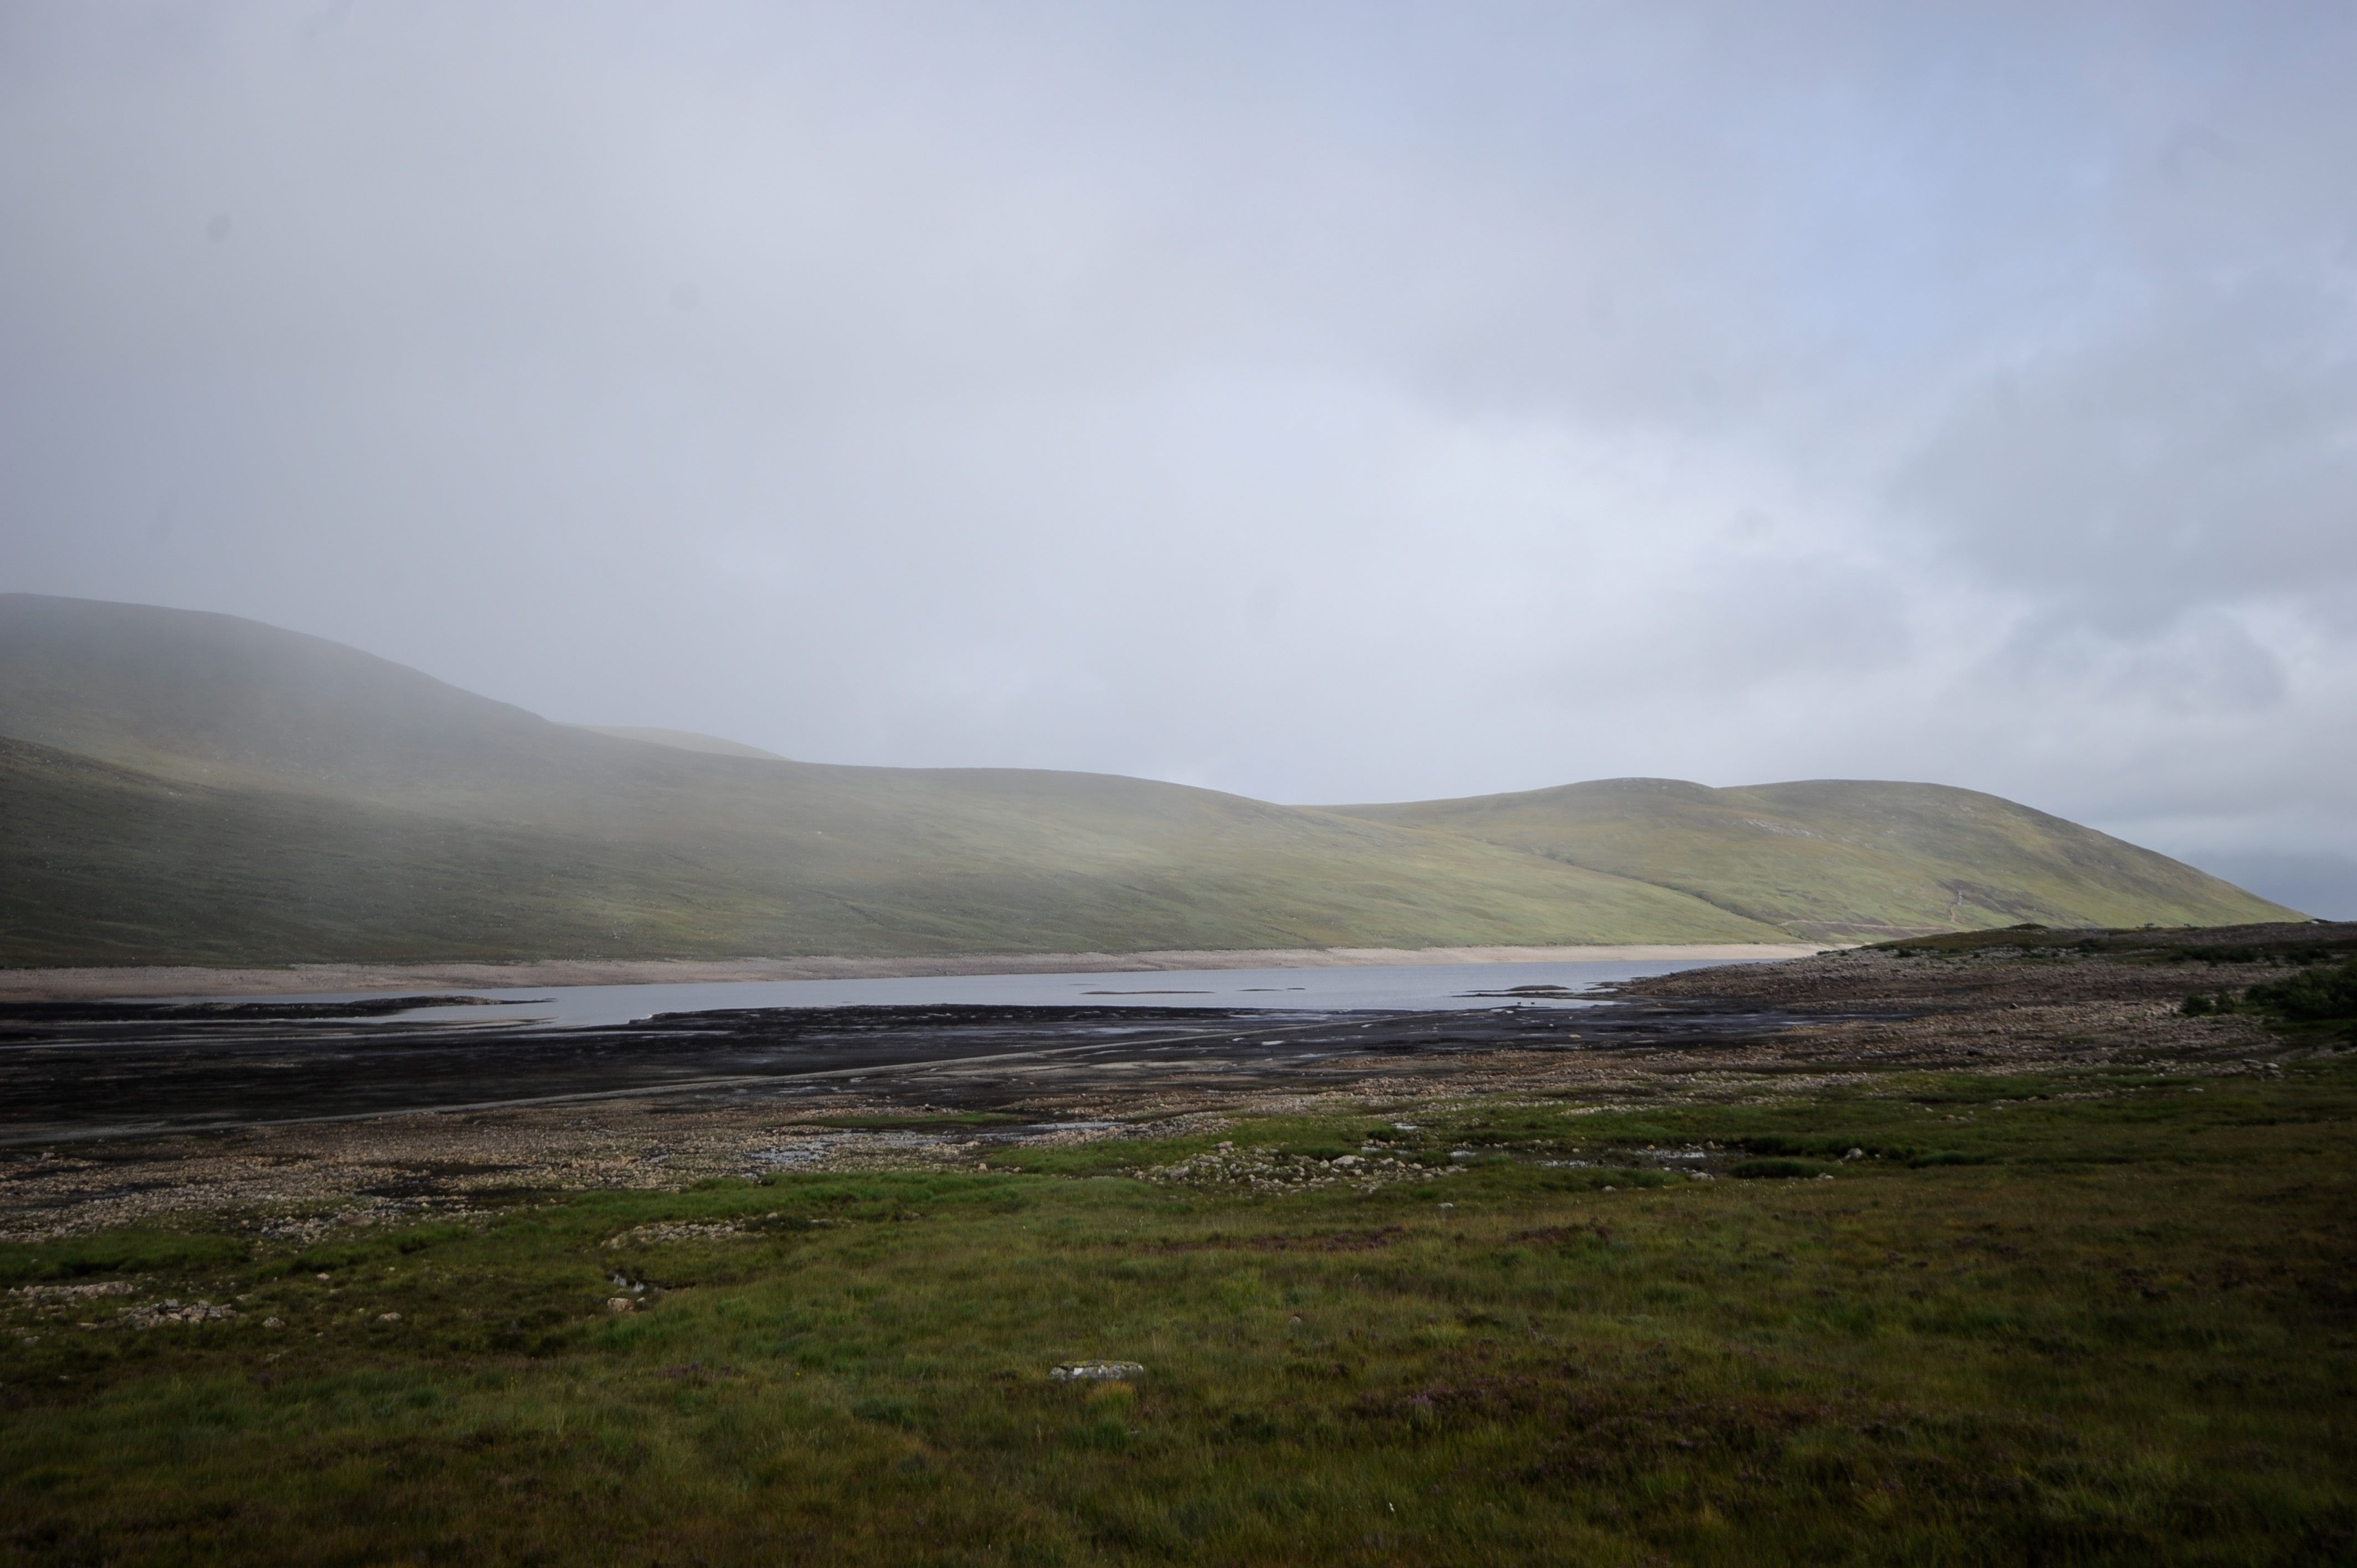 General view of Loch Glascarnoch